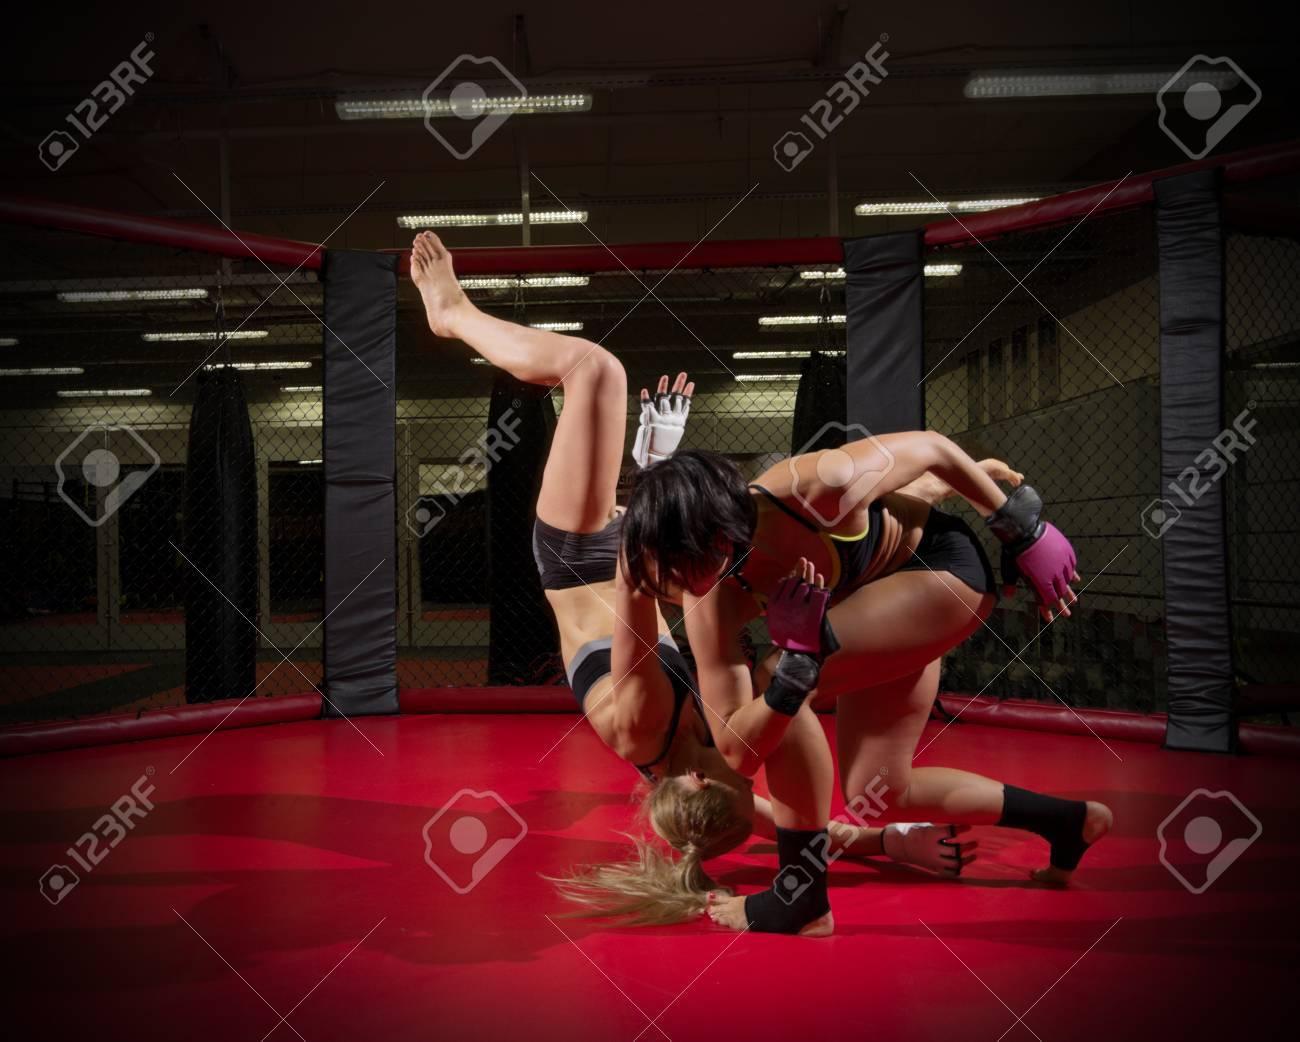 Vedios free woman wrestling